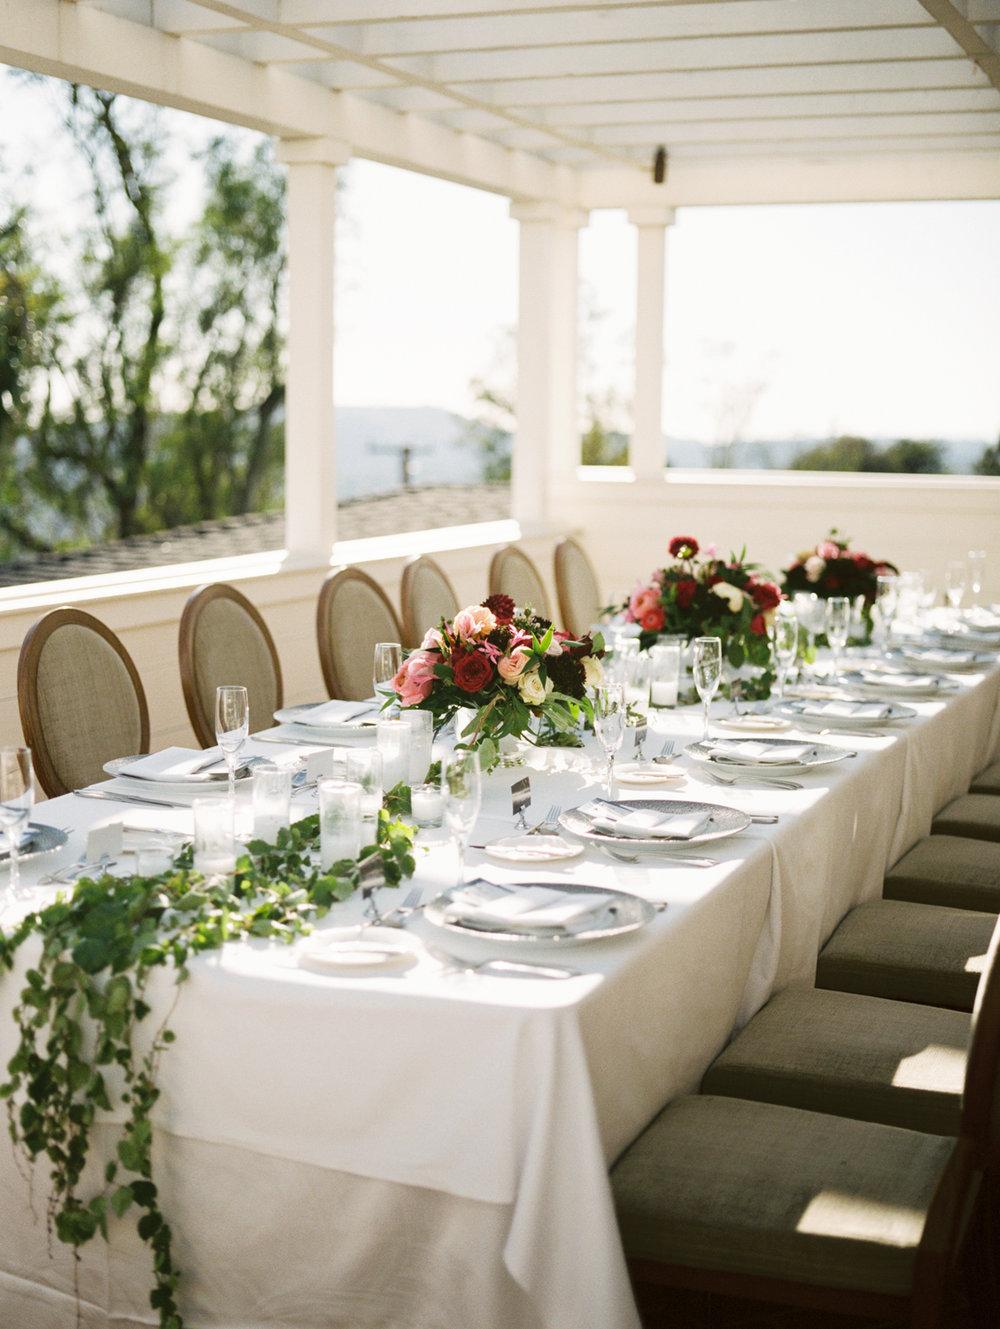 santa-barbara-elopement-elope-alegria-design-event-planner-coordinator-day-of-el-encanto-resort-lily-pond-wedding-intimate-red-maroon-city-ocean-view-rooftop (24).jpg